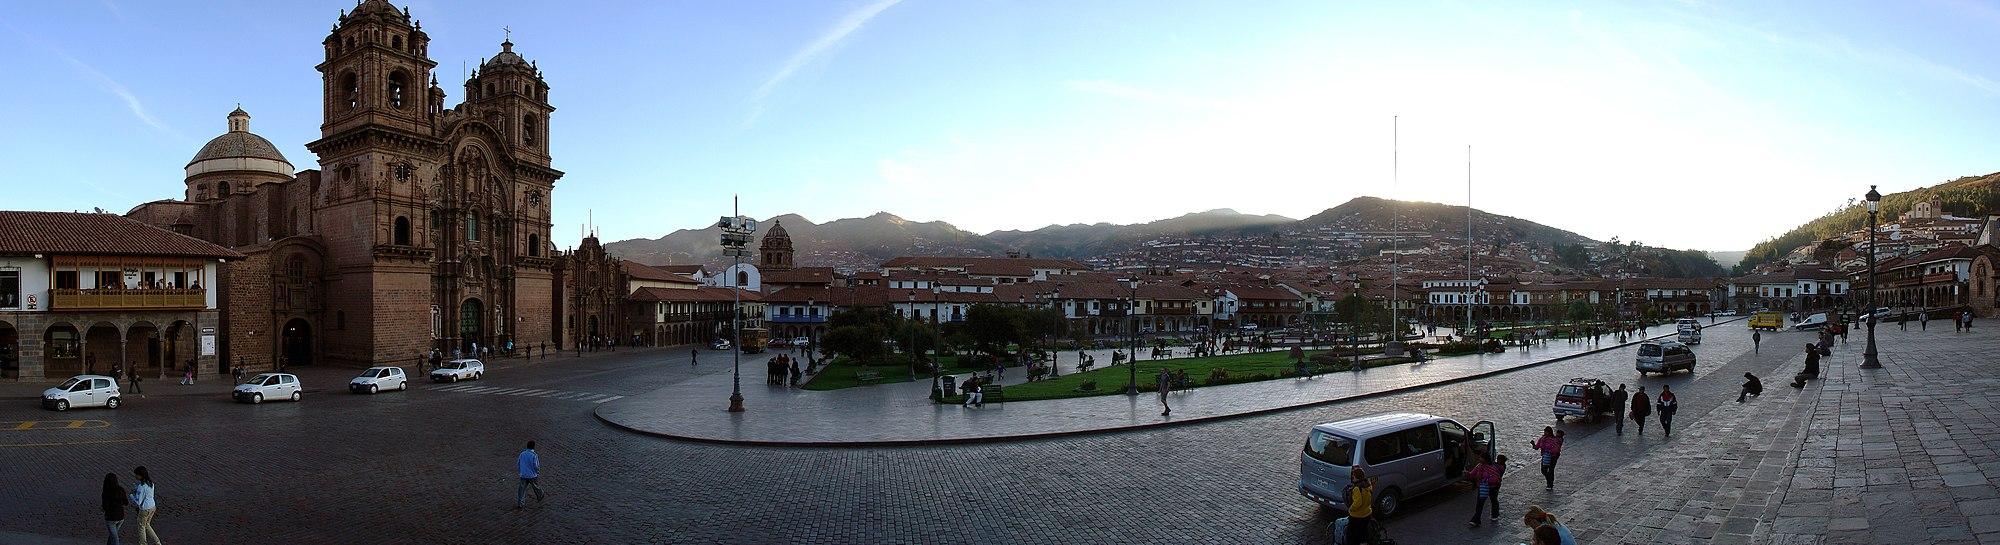 18 - Cuzco - Août 2008.jpg